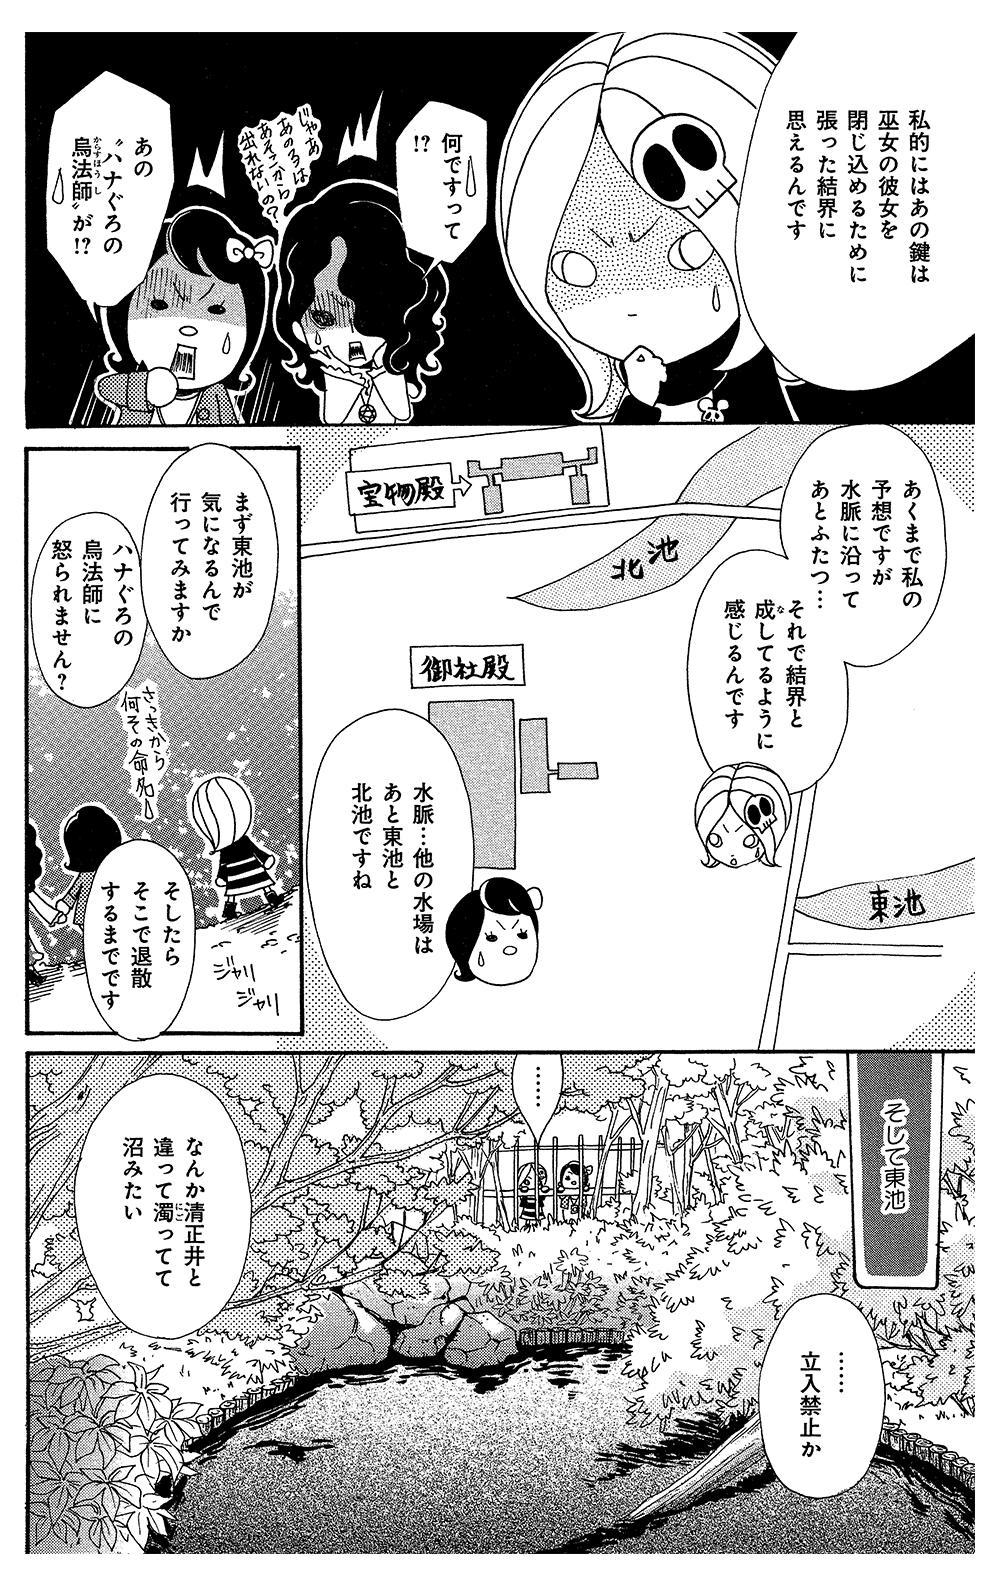 スピ☆散歩 第2話「清正井と明治神宮」②spsanp04-03.jpg